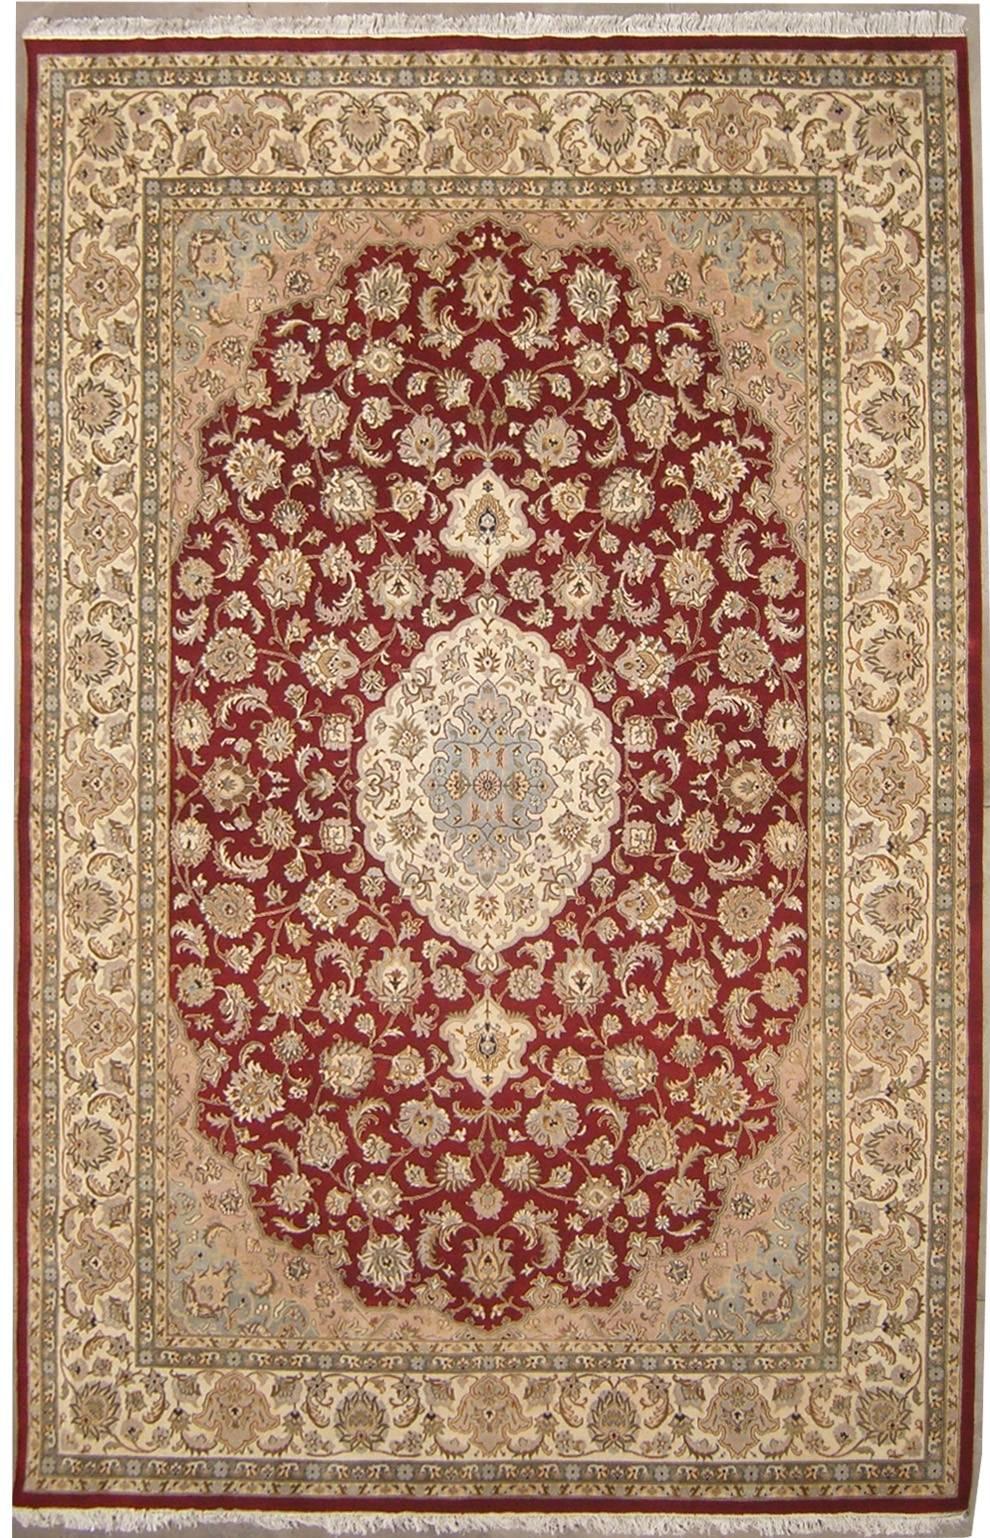 8 39 11x12 39 1 Rug Double Knott Pak Persian Design Handmade